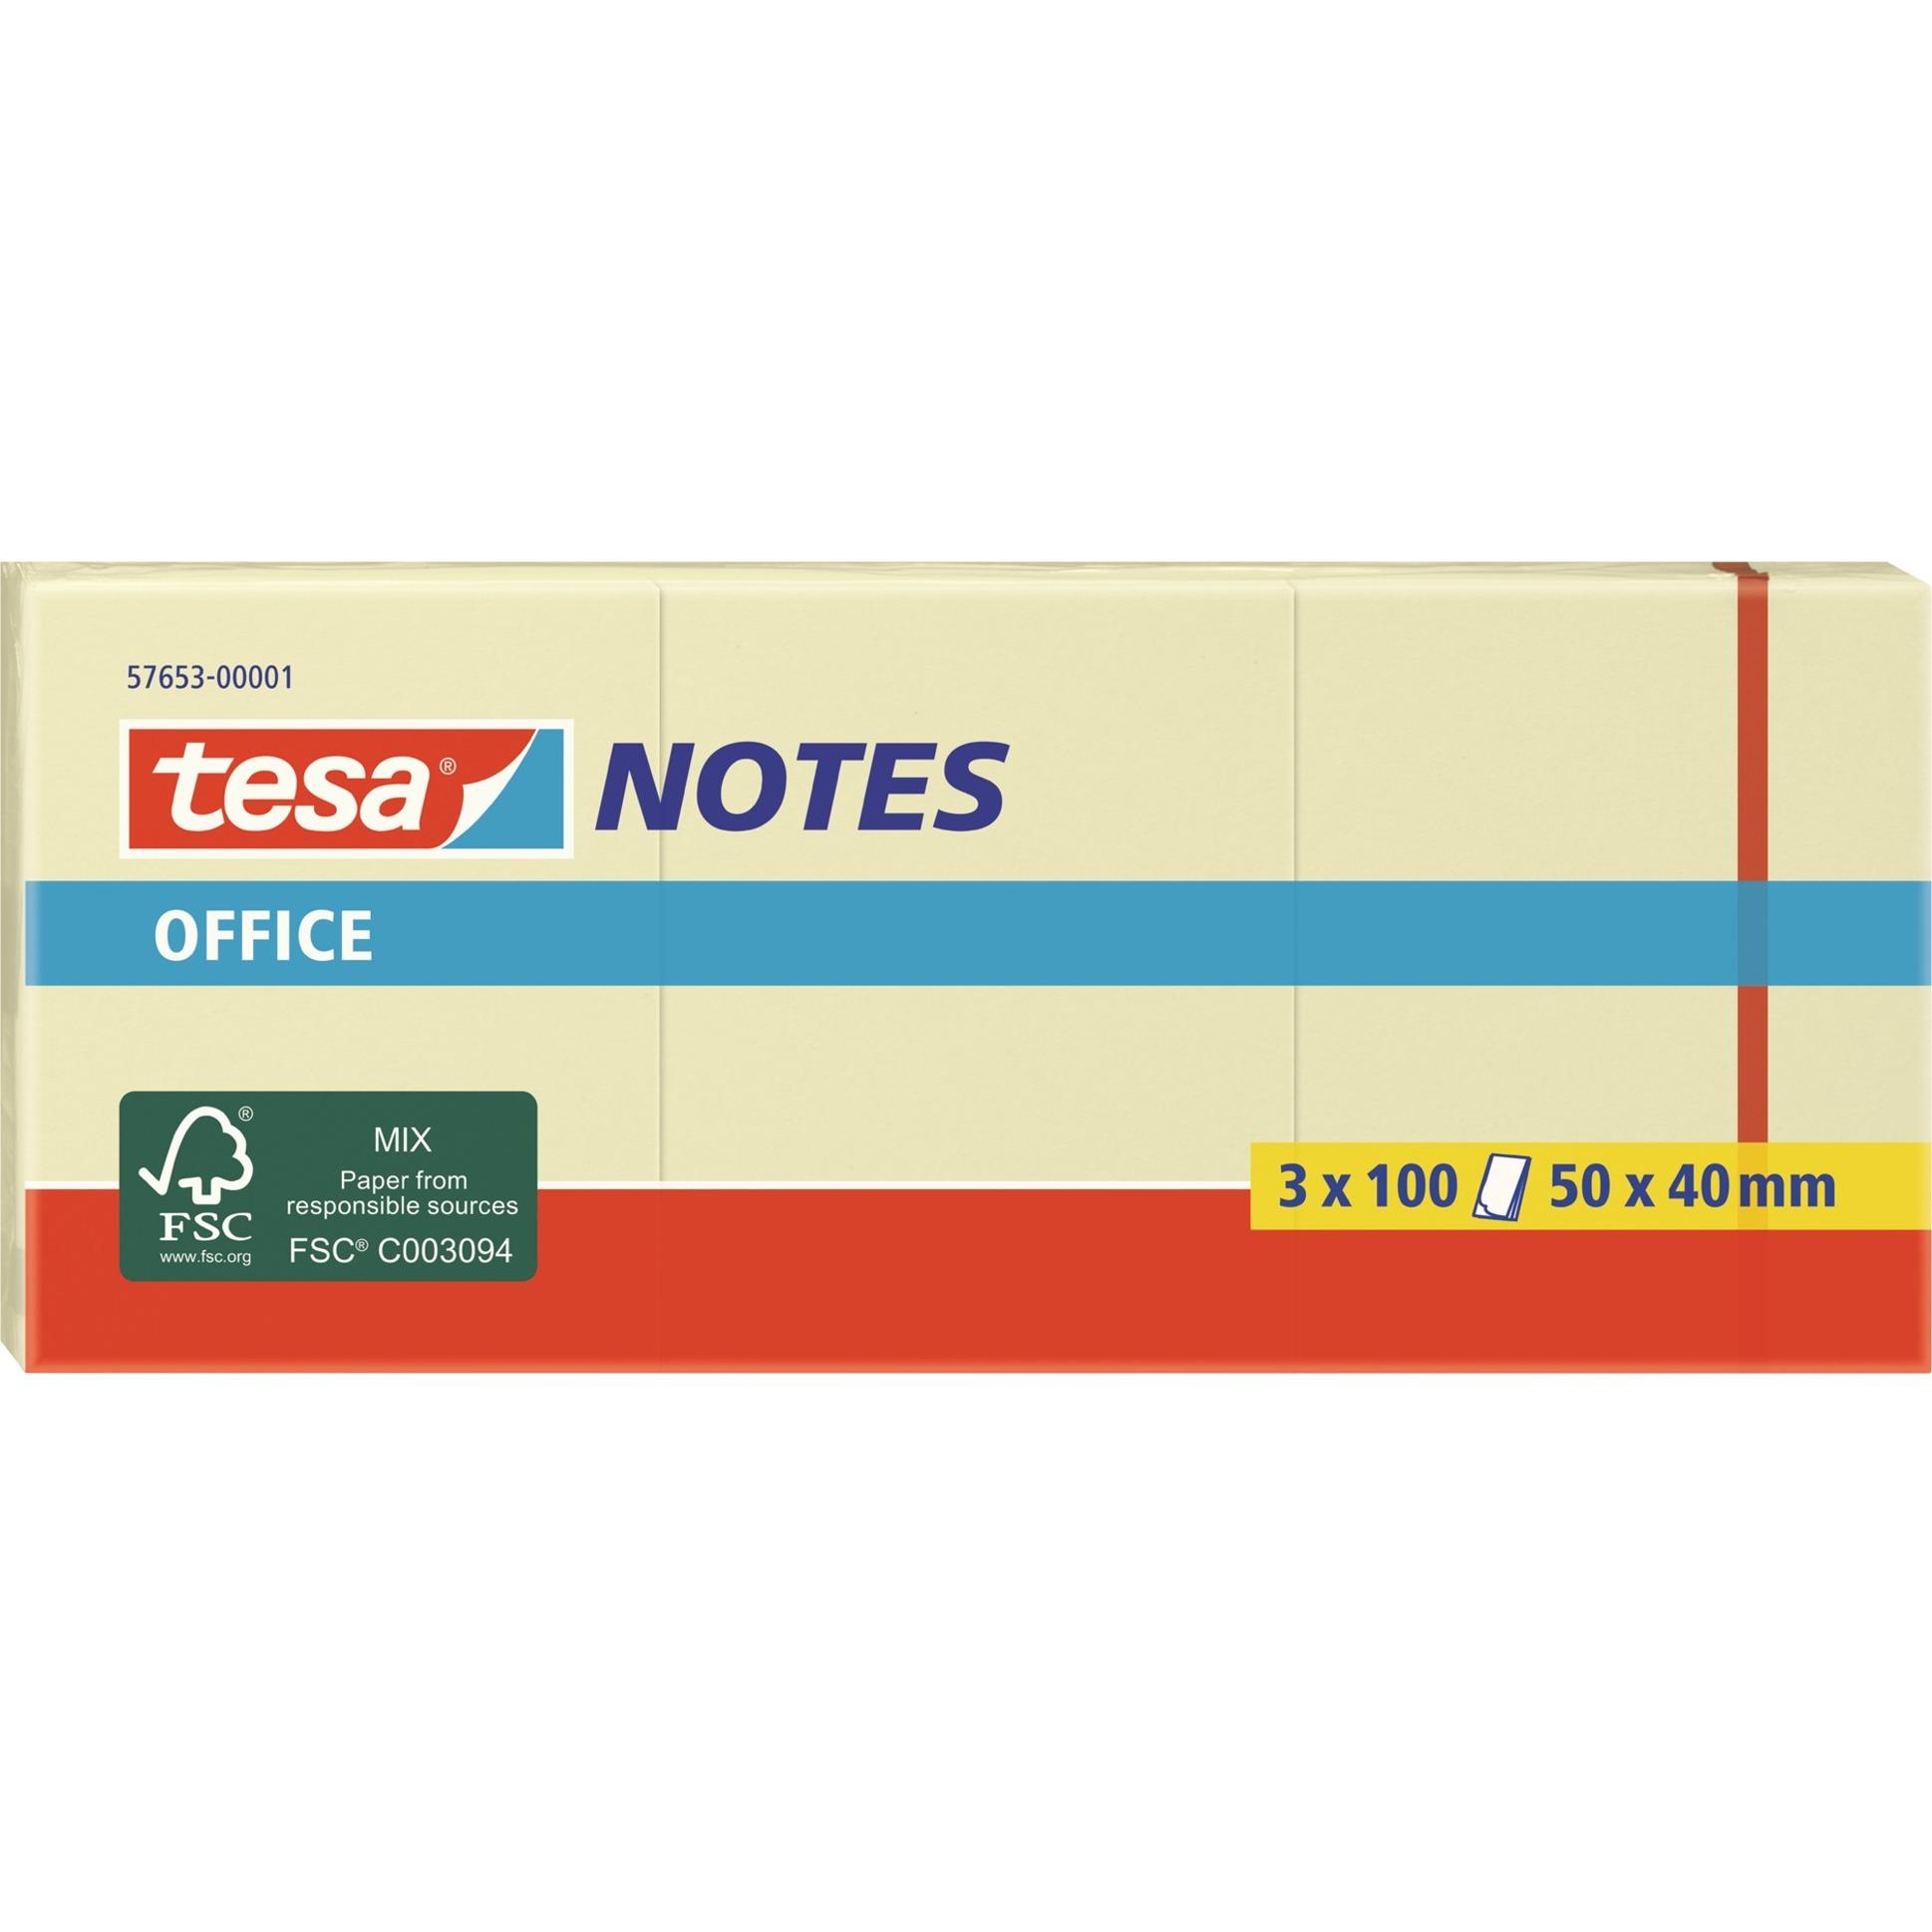 Image of Office Notes, 3 x 100 Blatt, Aufkleber